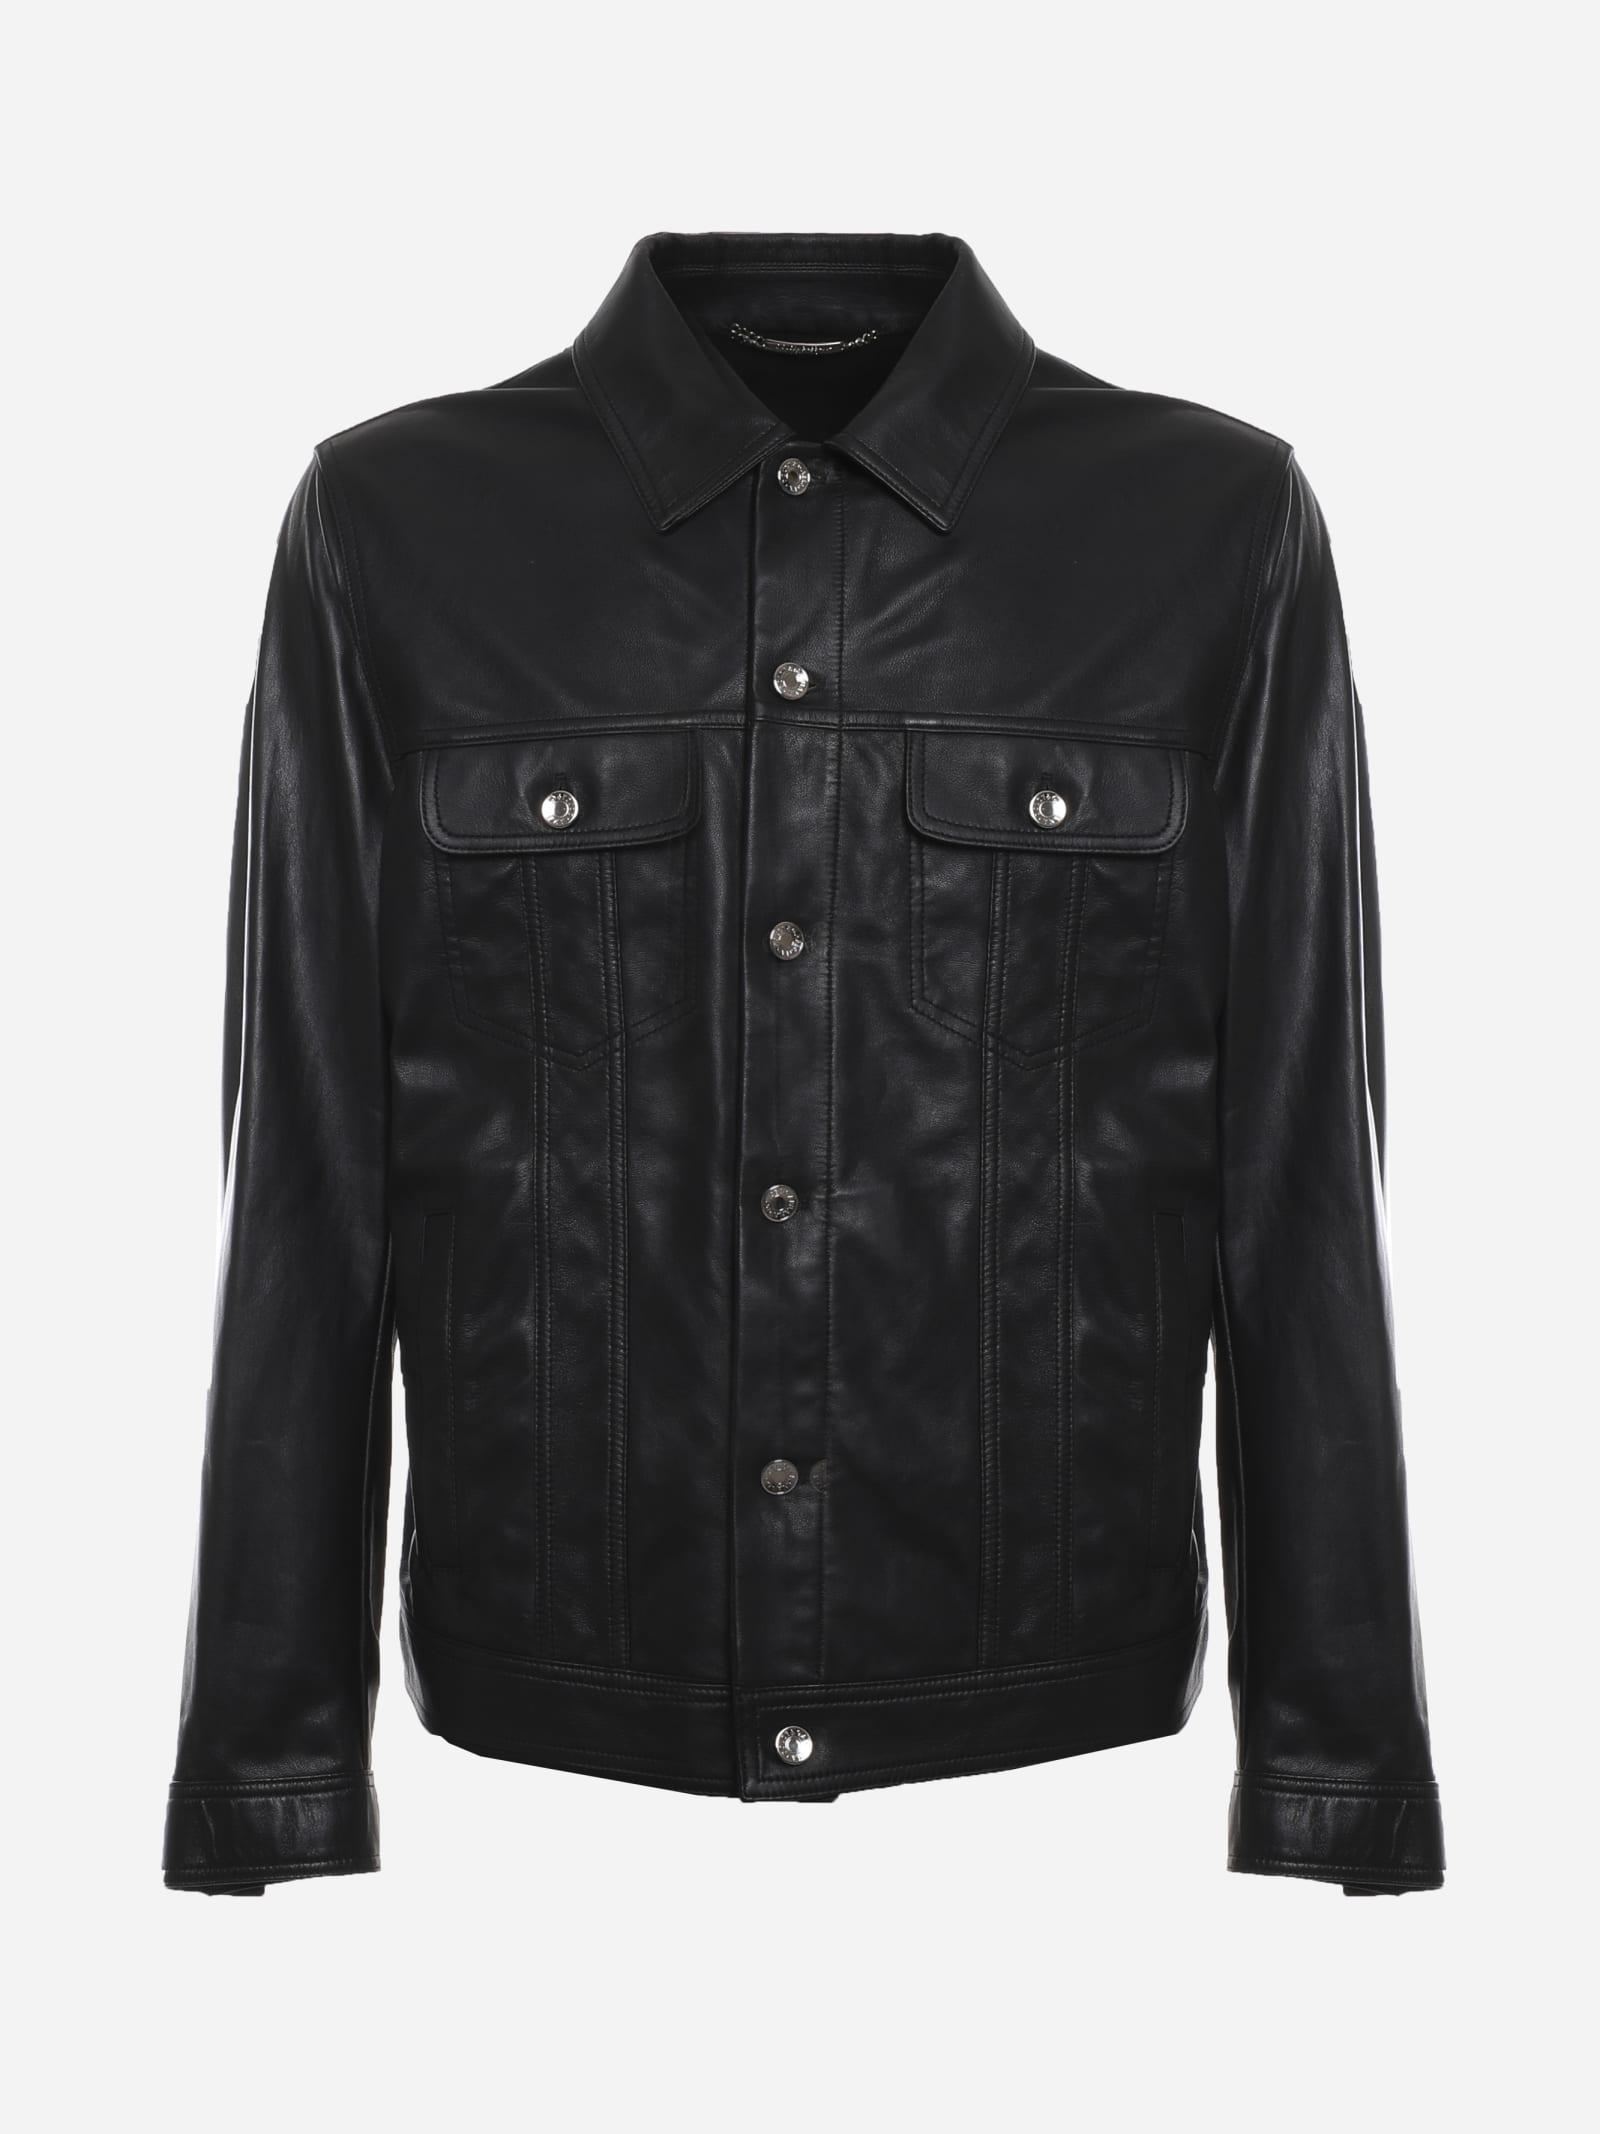 Dolce & Gabbana Leathers BLACK JACKET MADE OF LEATHER